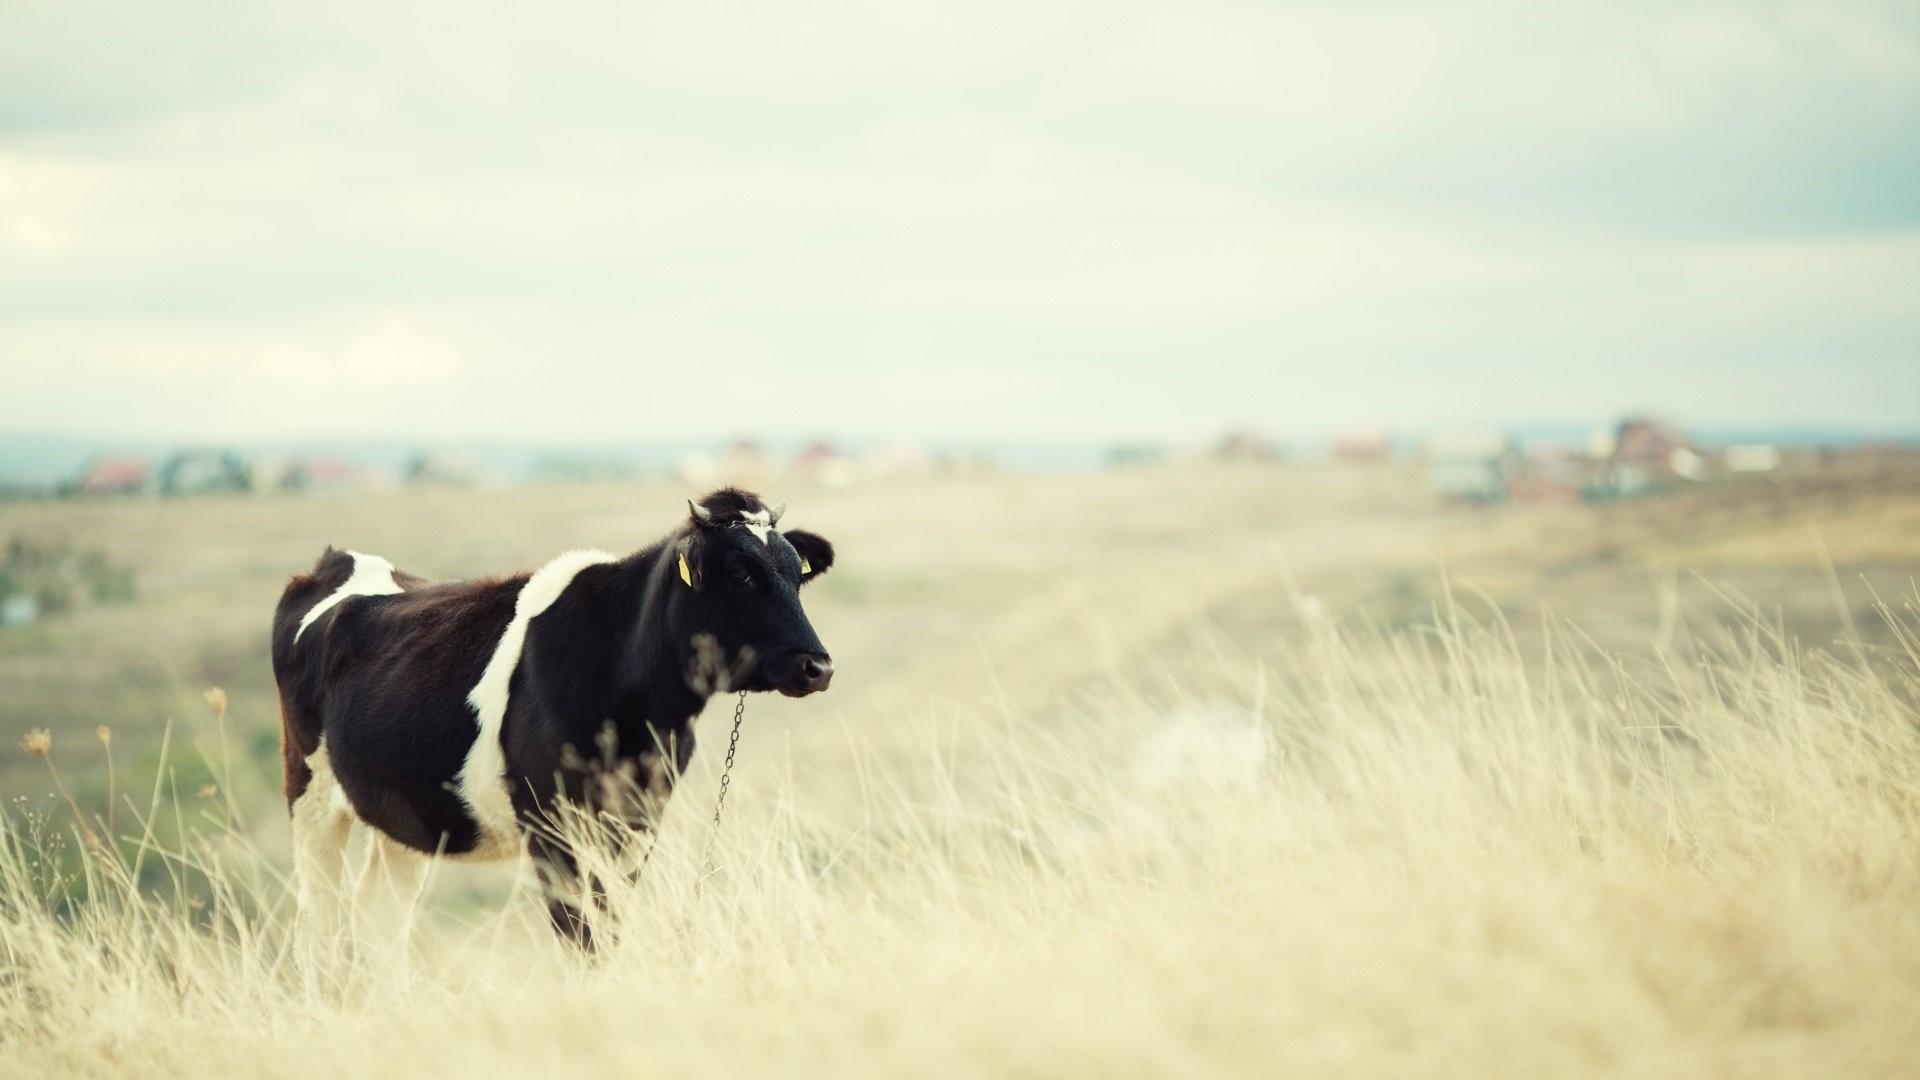 Cow HD Wallpaper